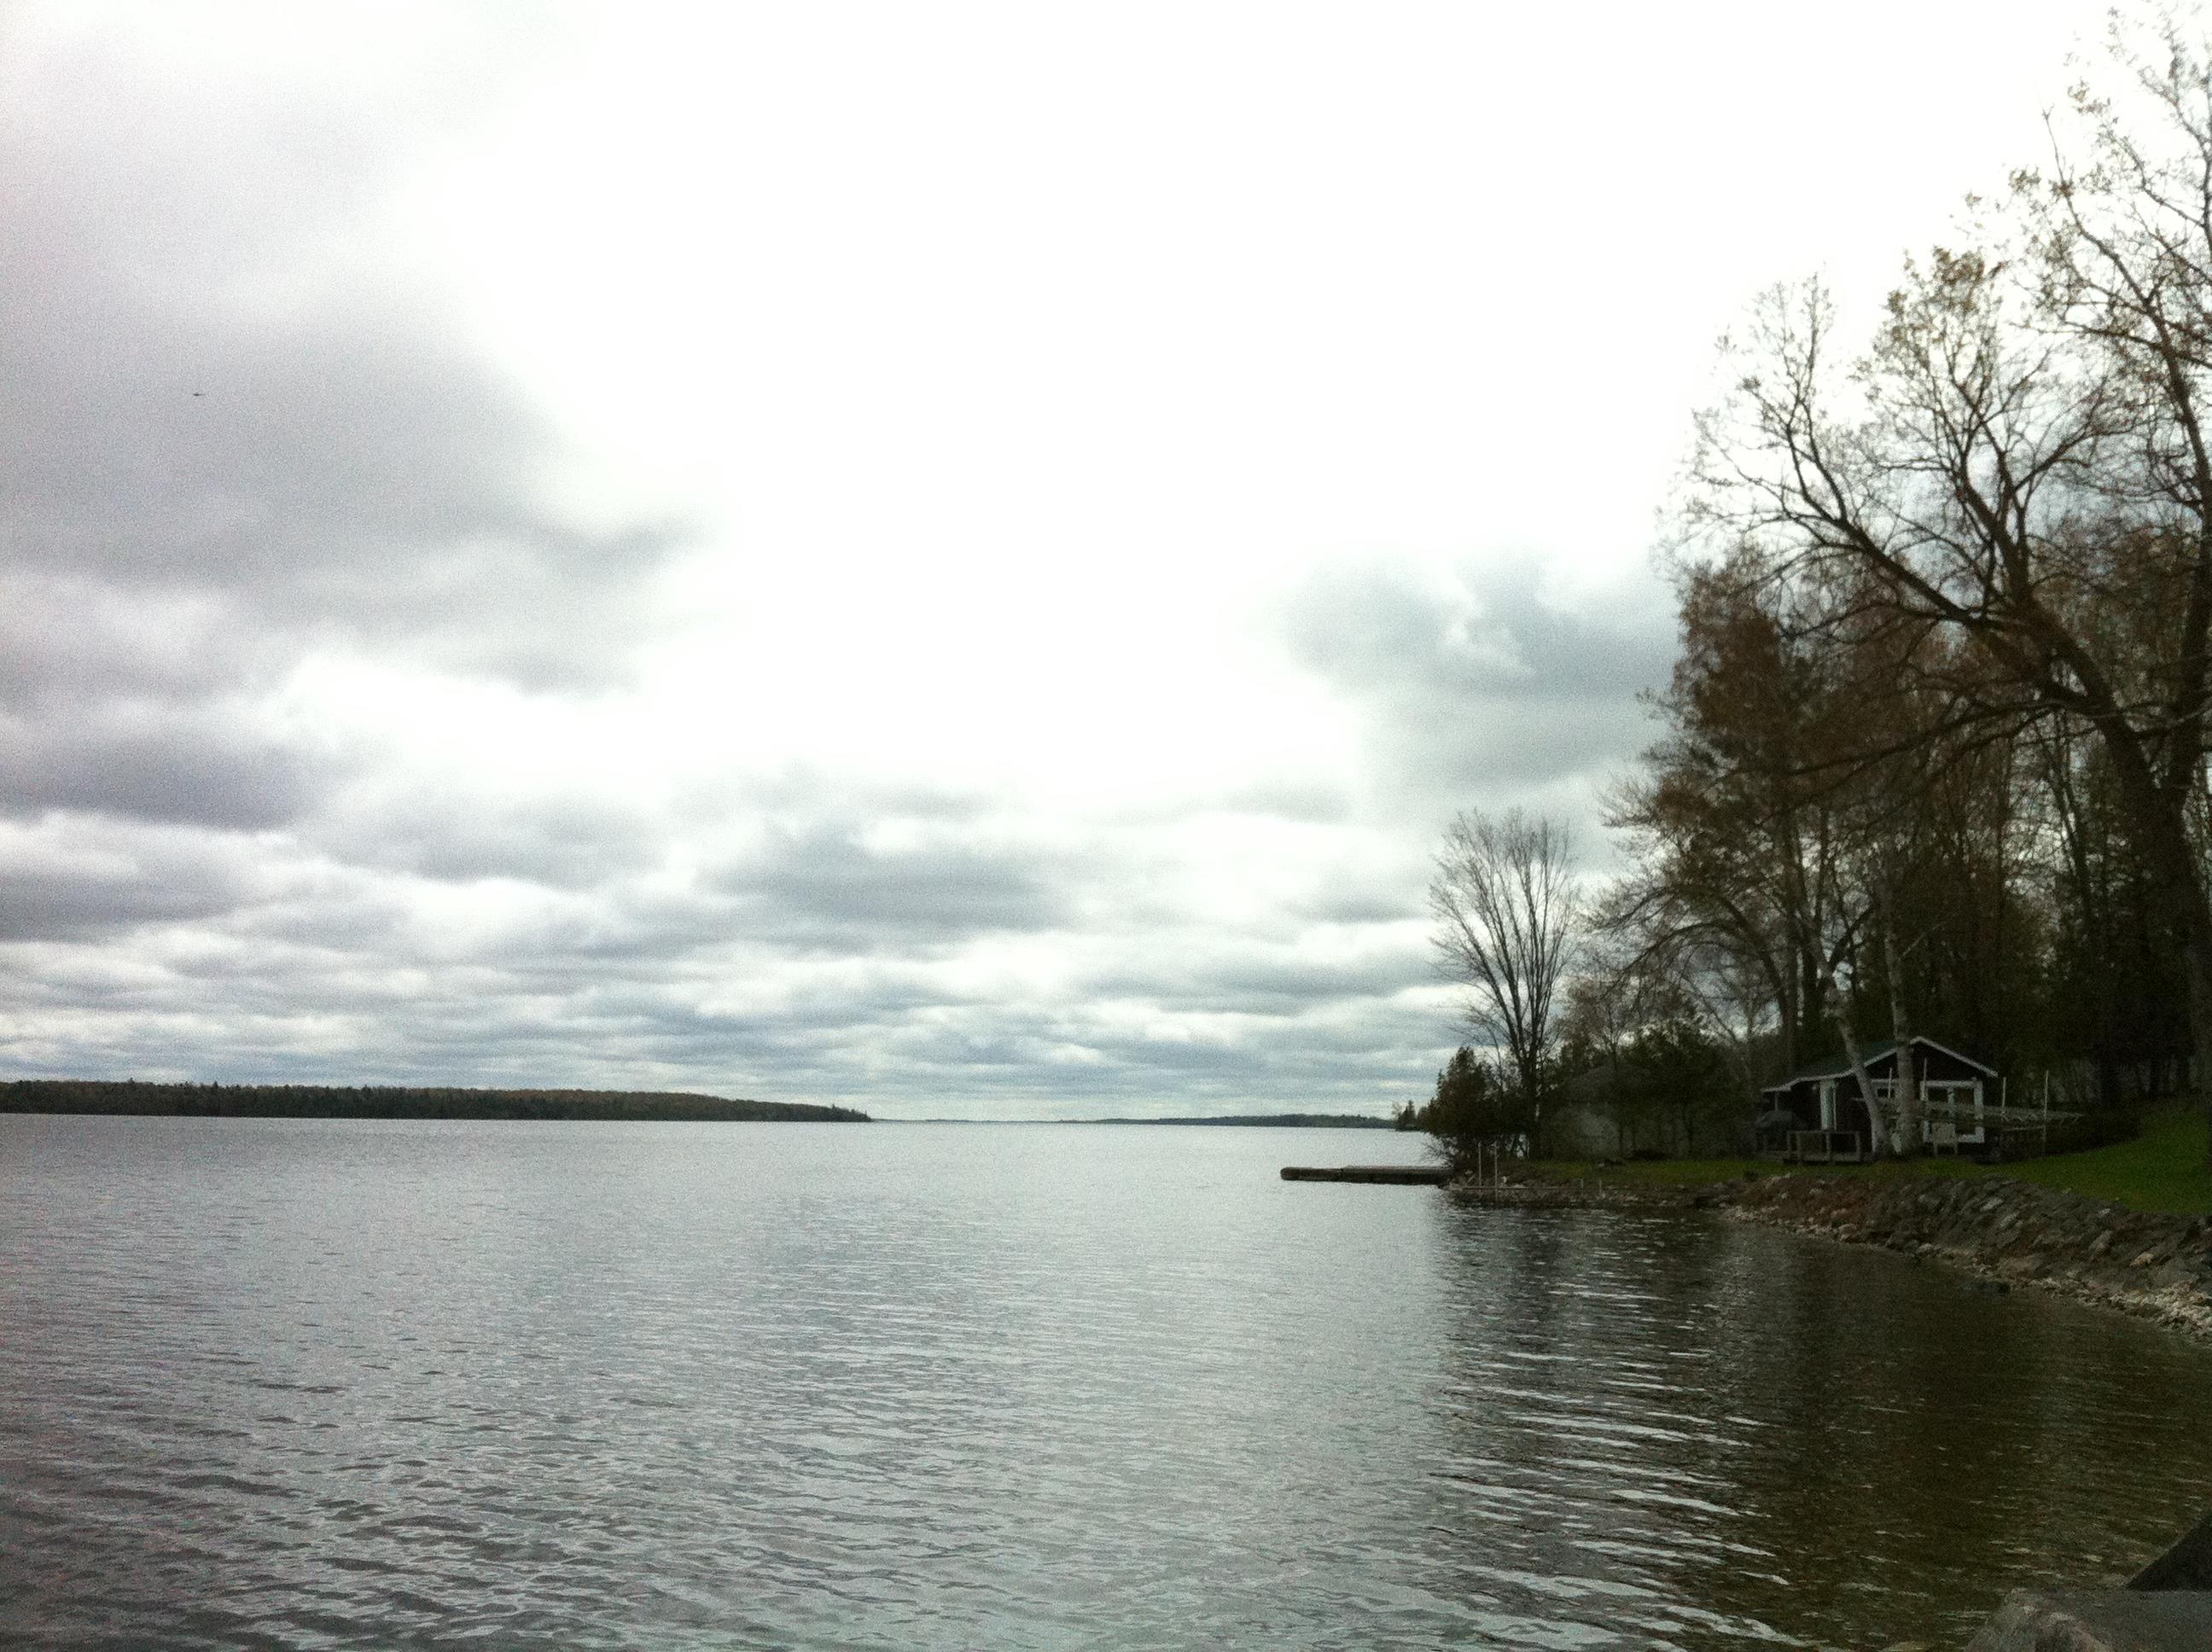 Pigeon Lake - Bobcaygeon-homesforsale - Brad Nelson - kawarthabrad